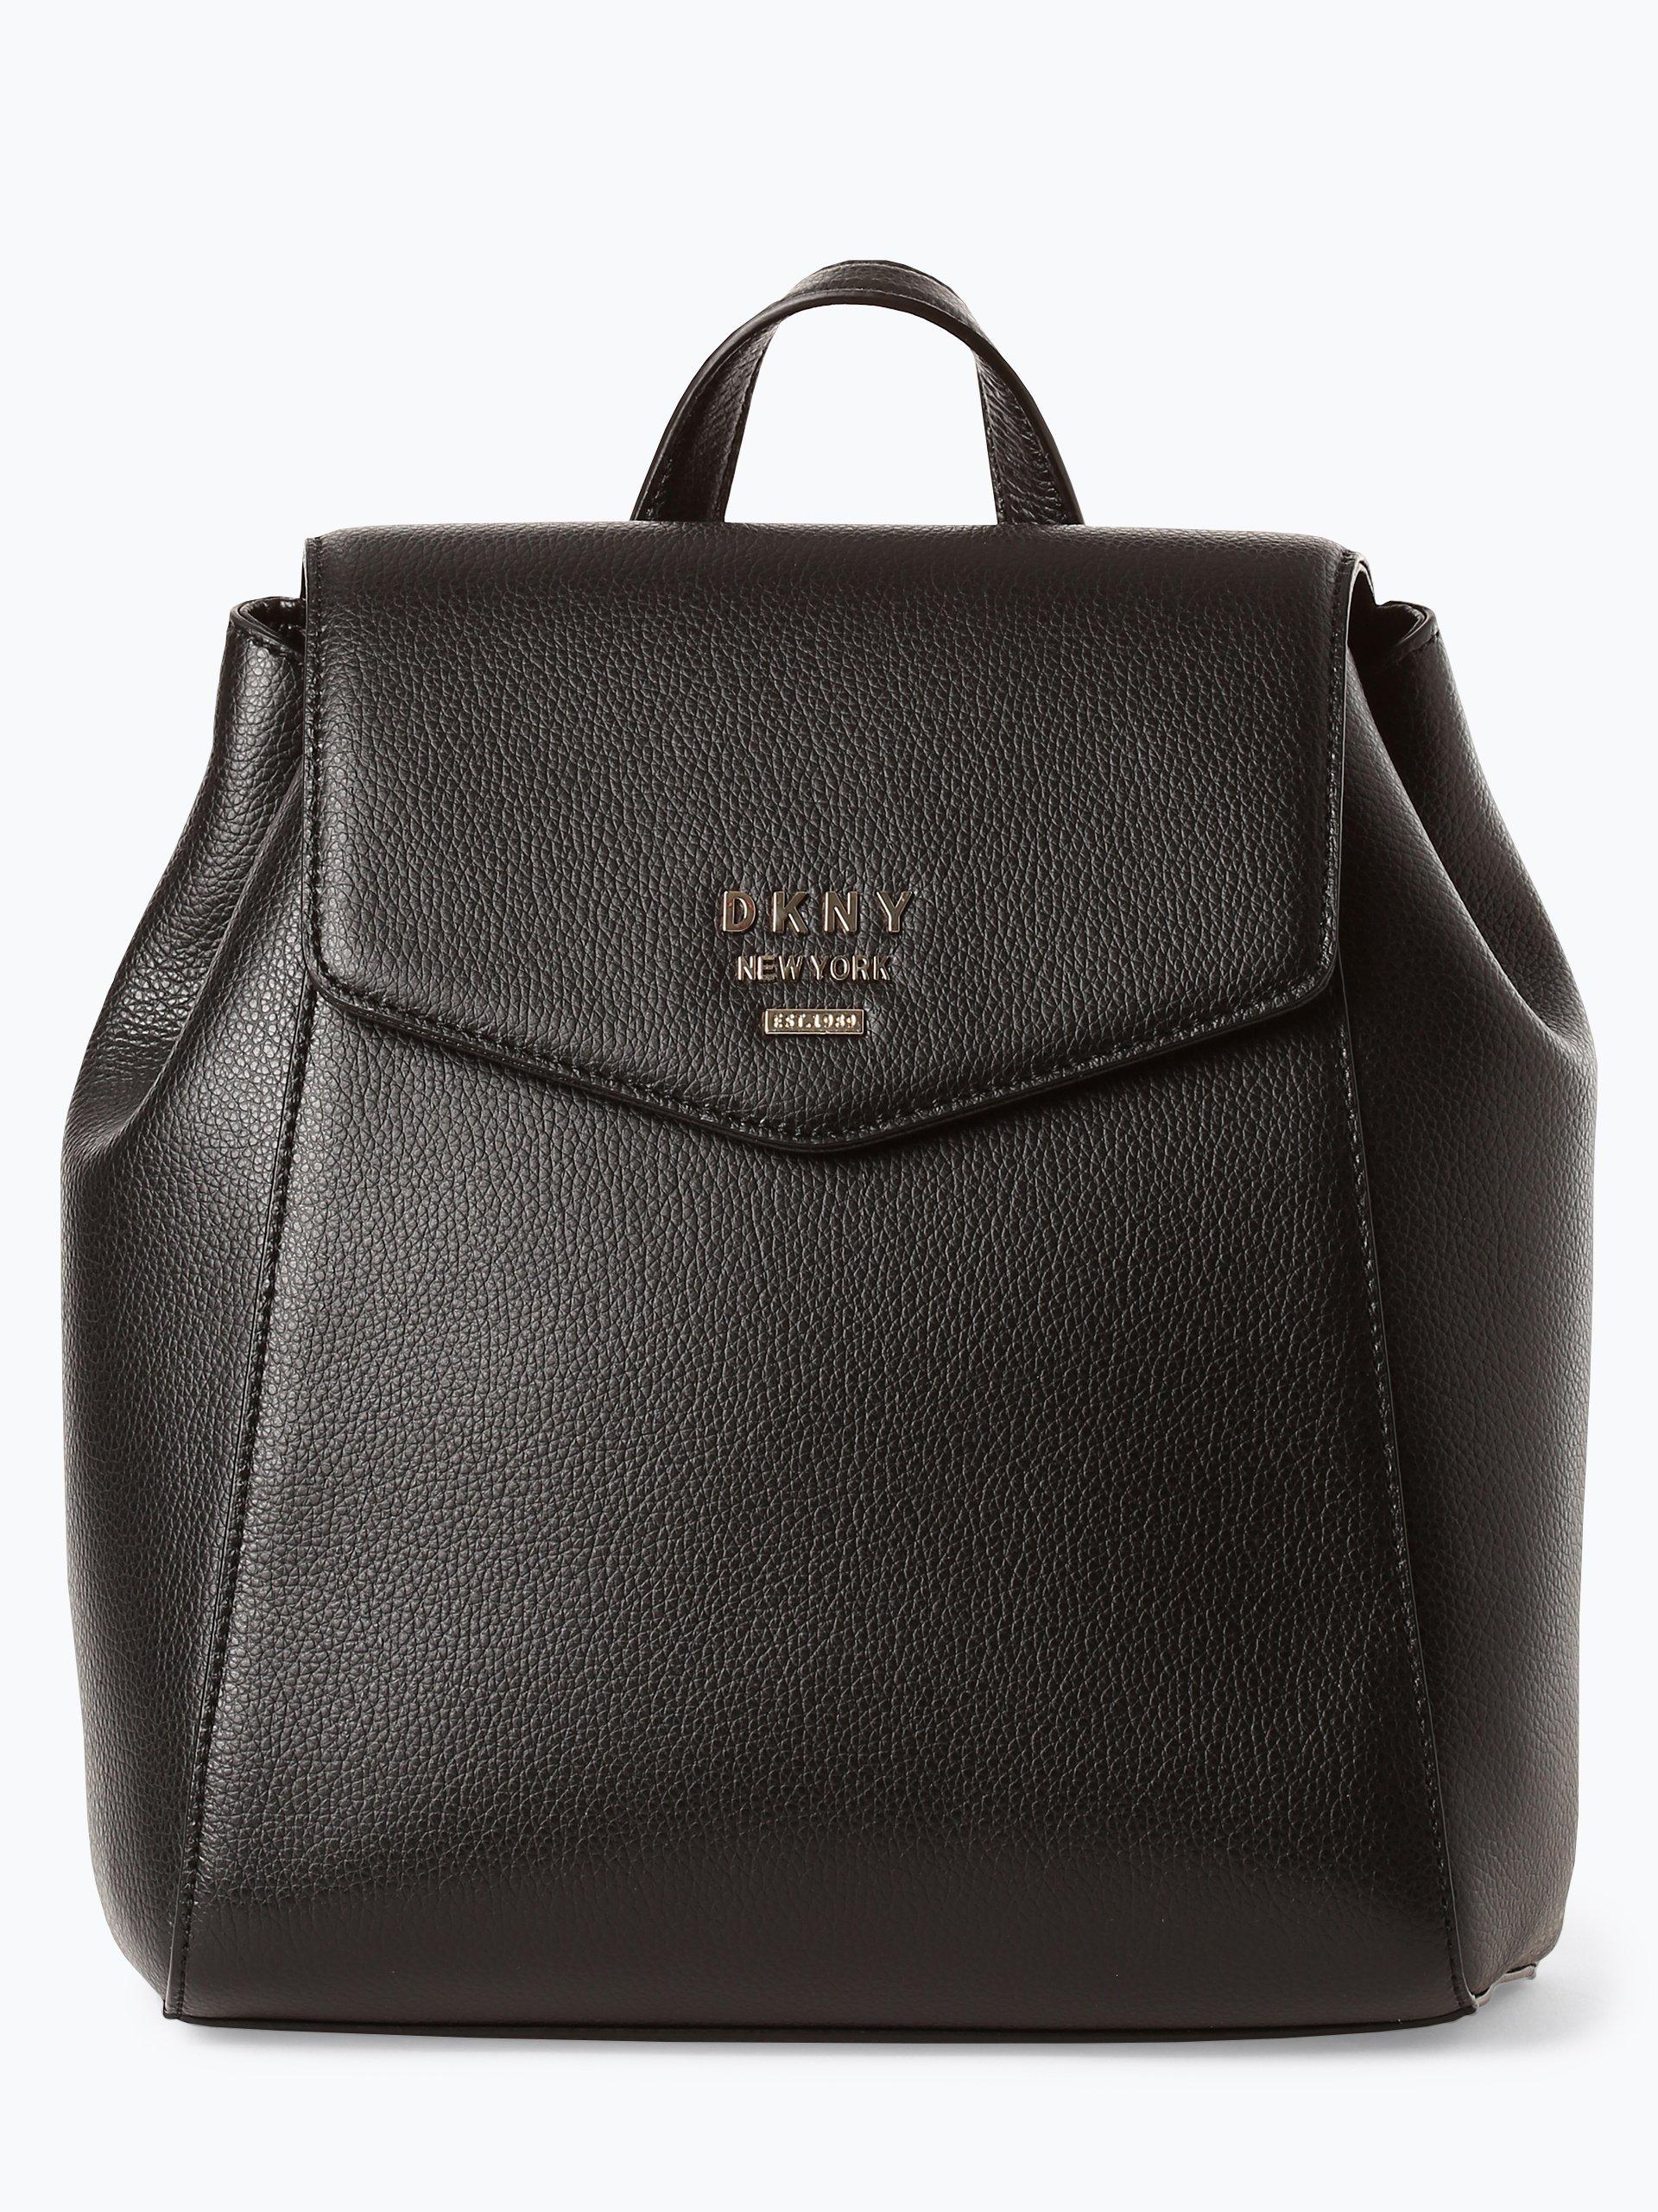 DKNY Damen Rucksack aus Leder